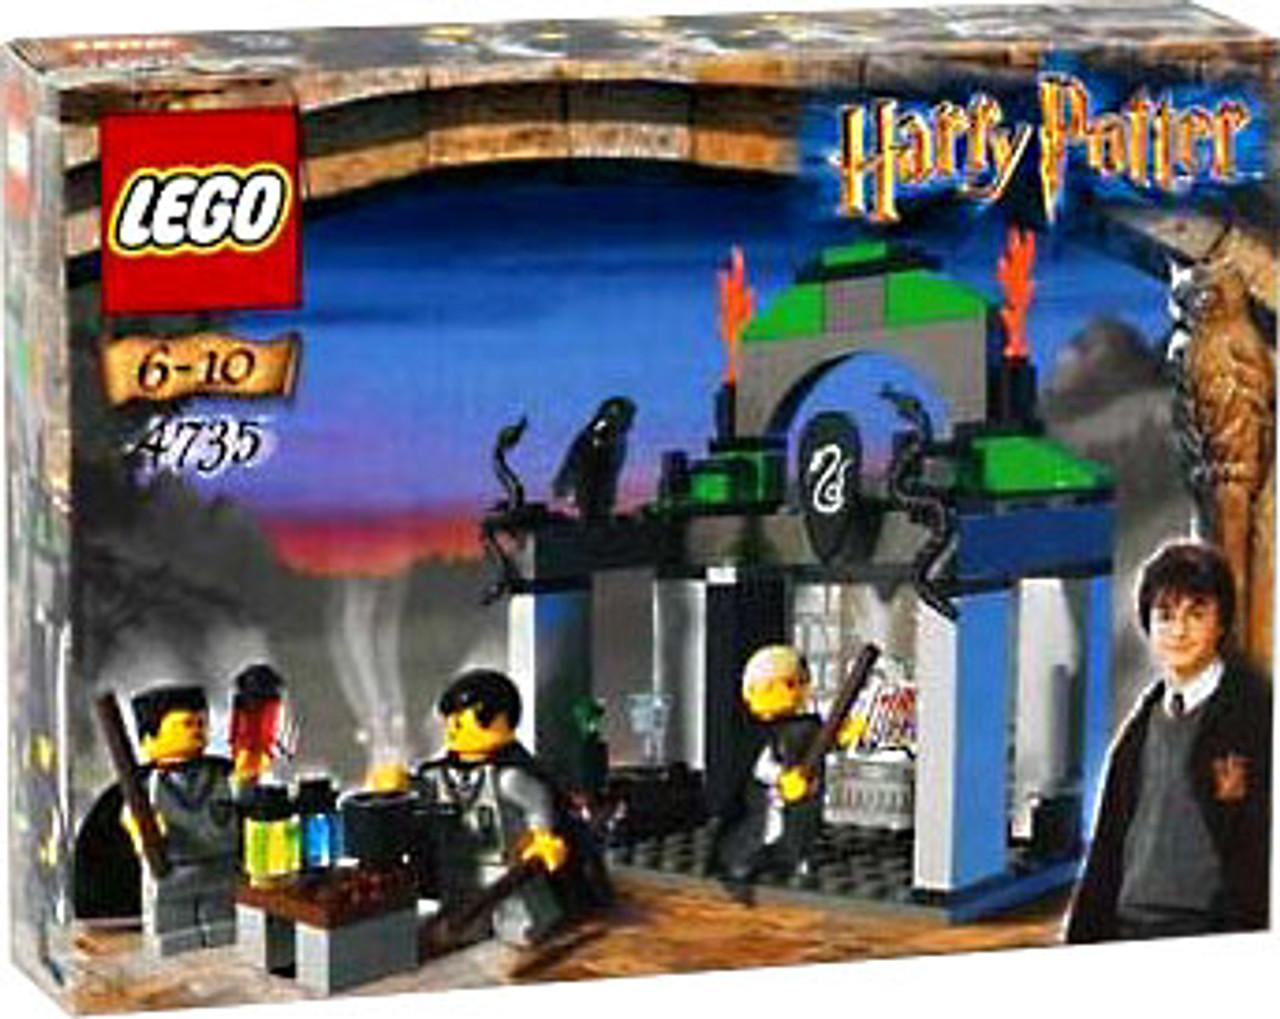 LEGO Harry Potter Series 1 Chamber of Secrets Slytherin Set #4735